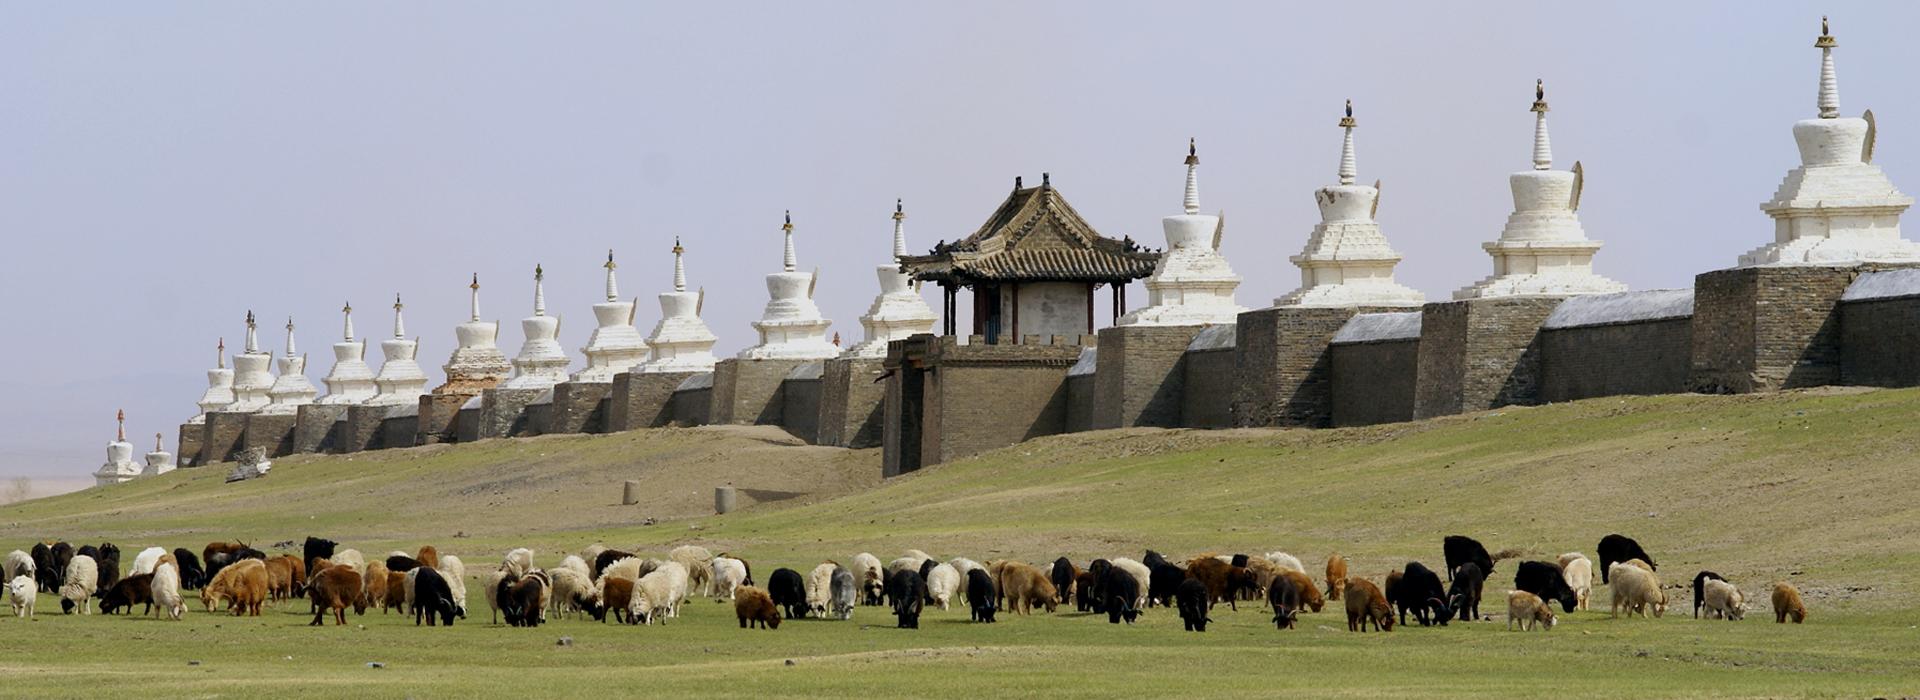 buddhist_monastery_mongolia